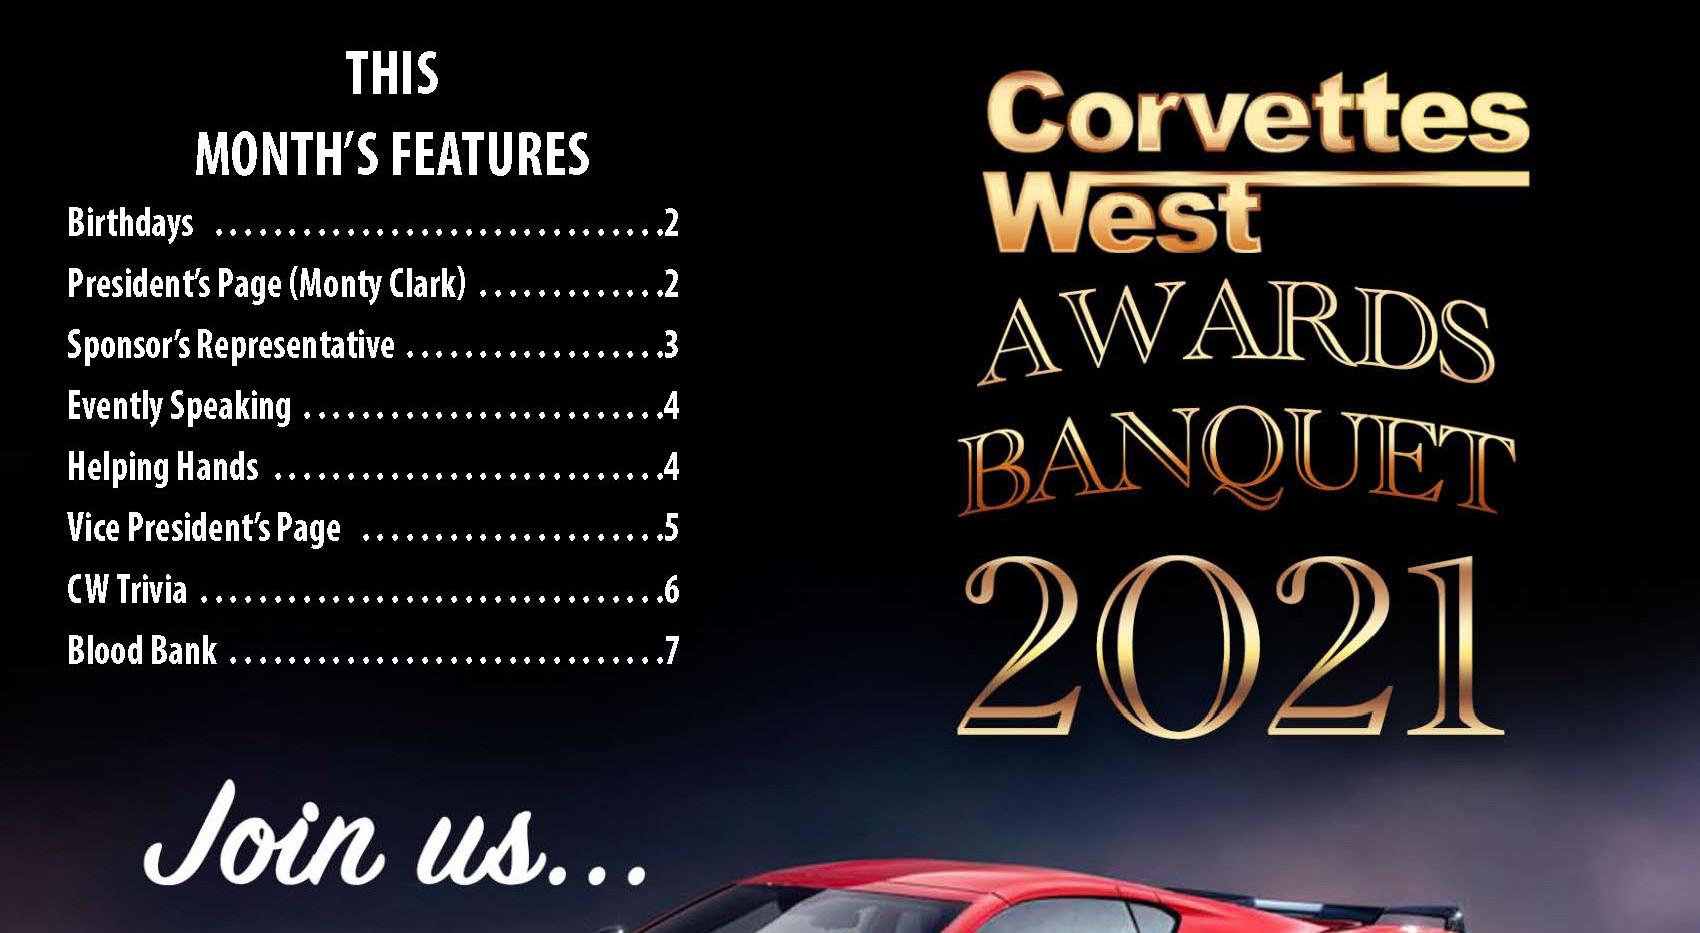 corvettes west news 421_Page_1.jpg